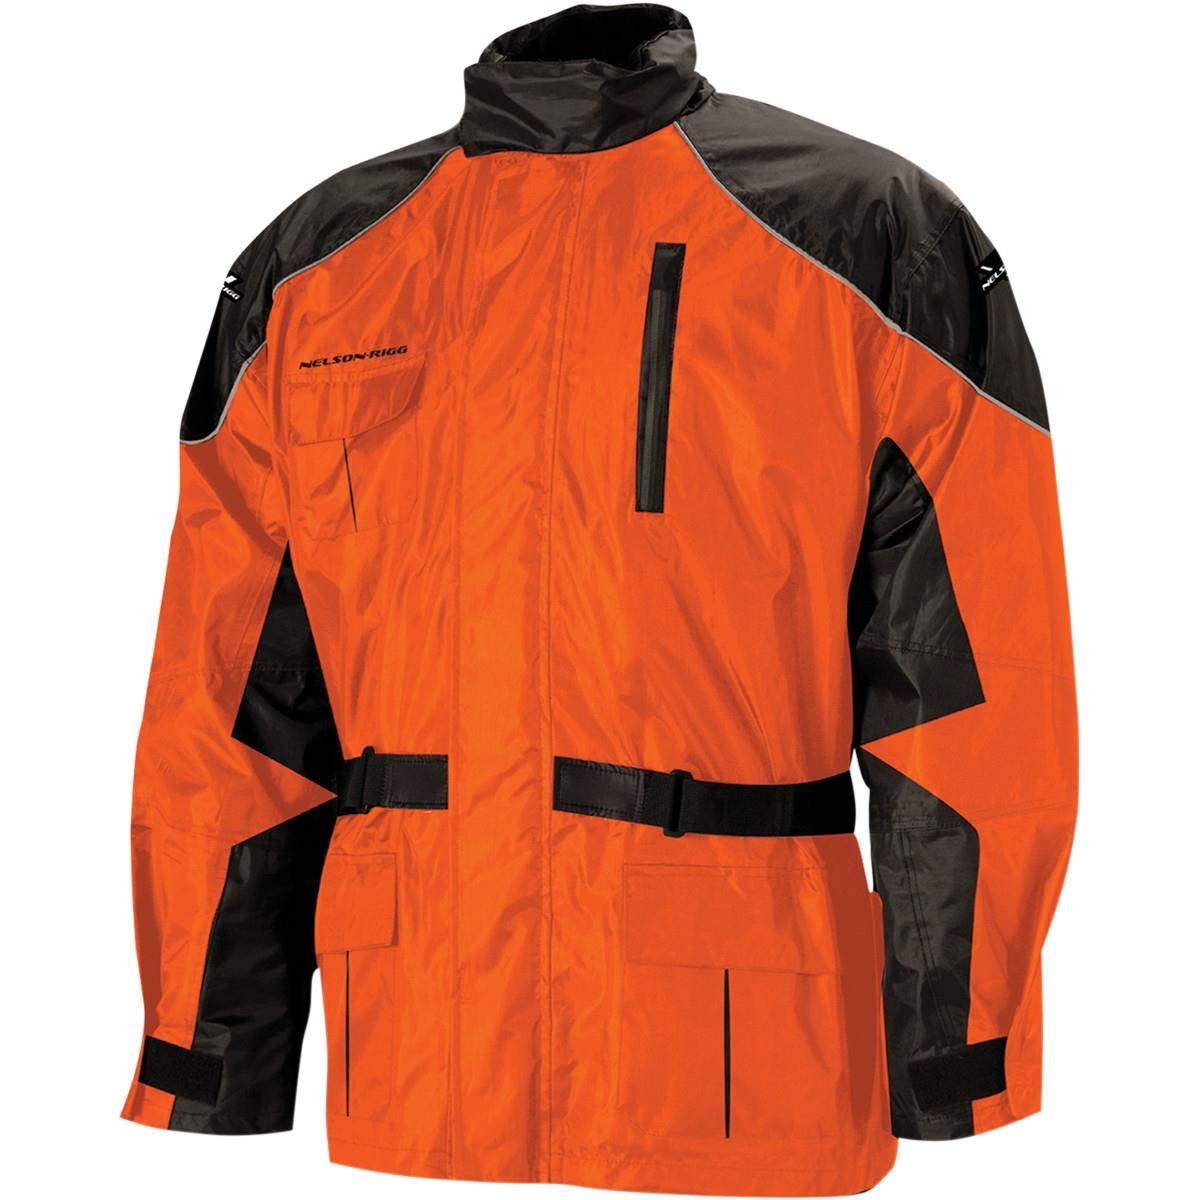 Nelson-Rigg AS-3000 Aston Rain Suit (Orange, 4X-Large) AS3000ORG074XL